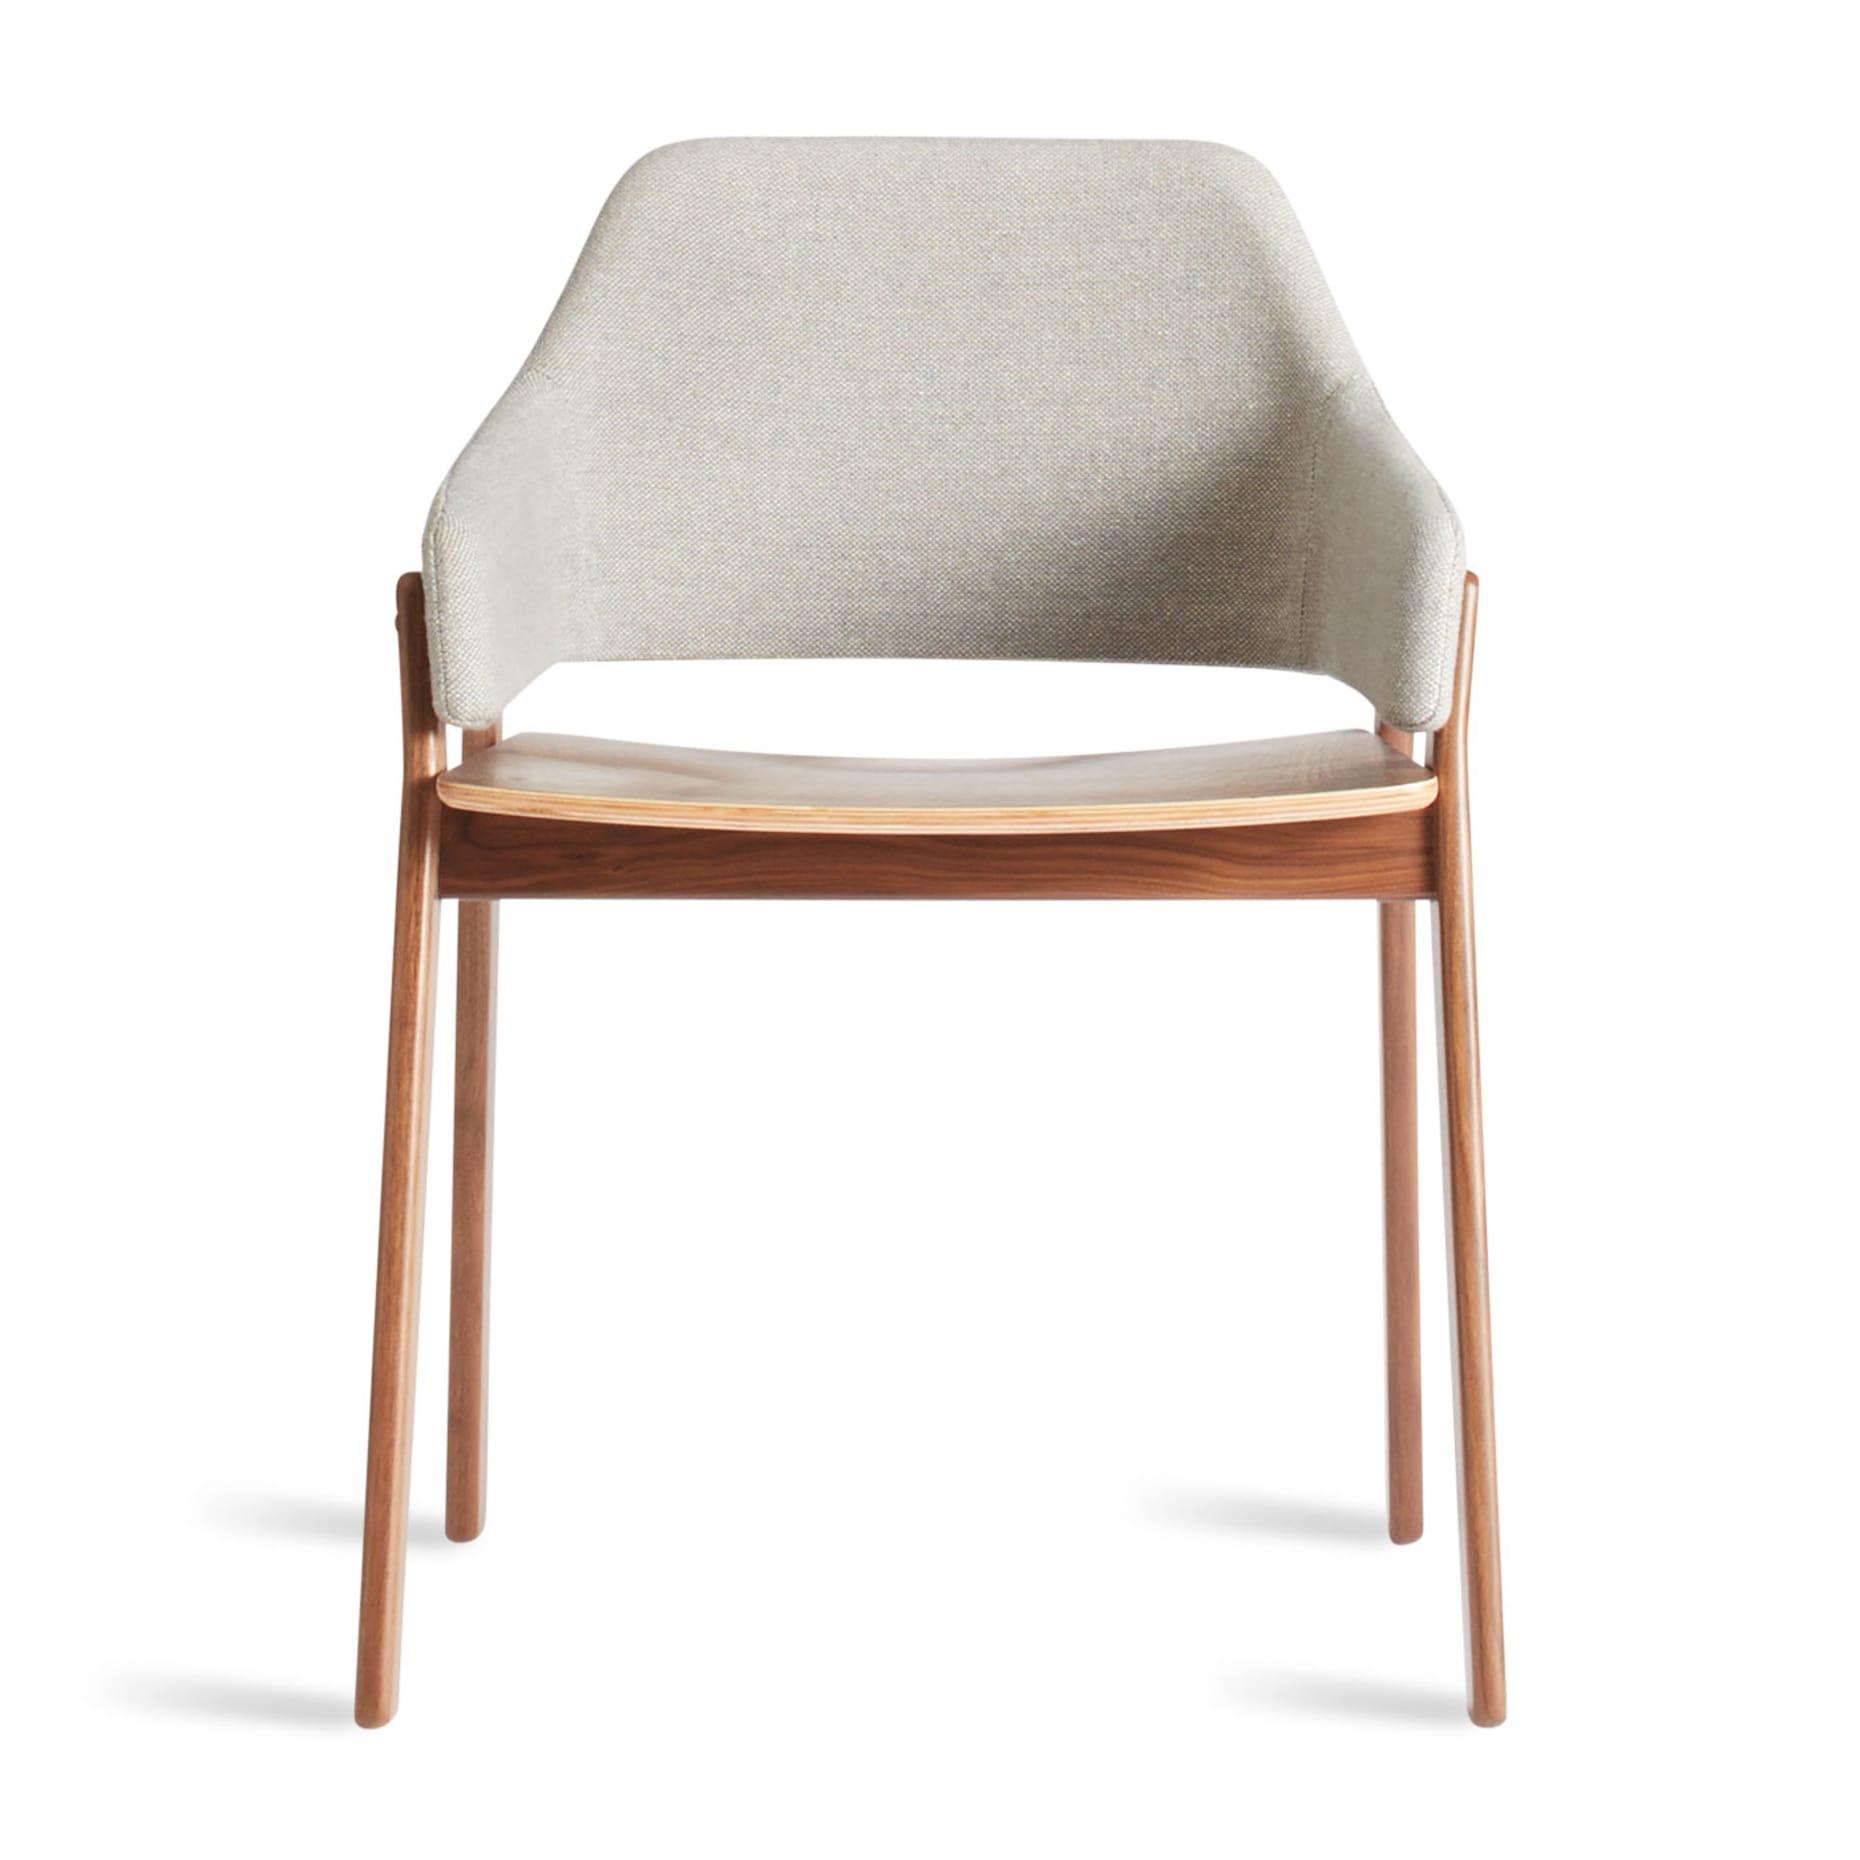 cc1 chrwl gy front clutch chair edwards light grey walnut